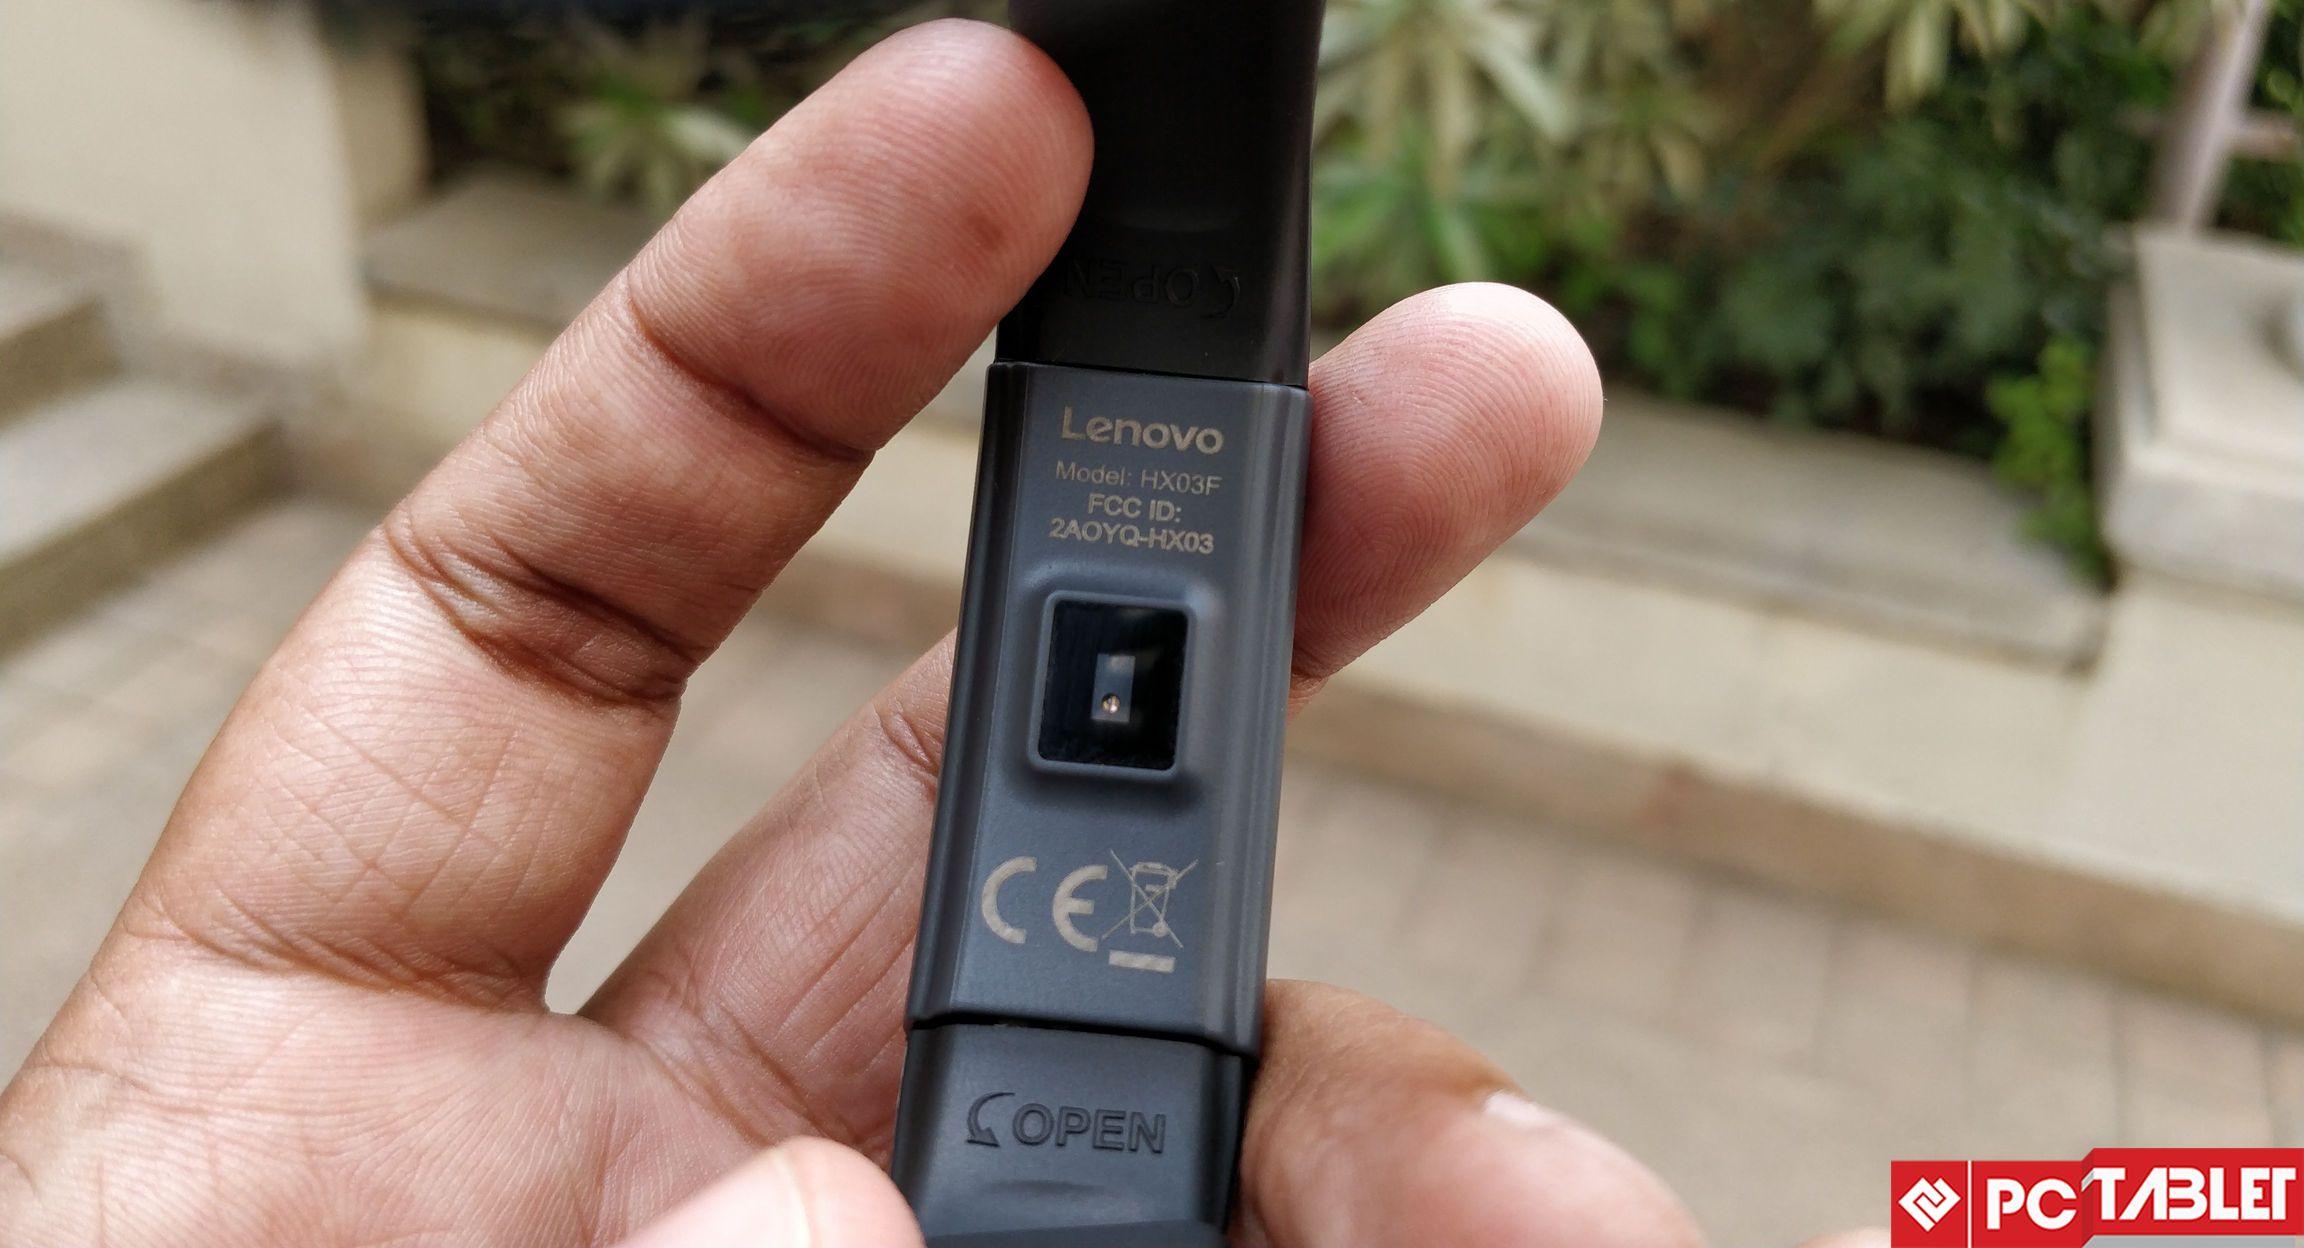 Lenovo HX03F fitness Band 5 result